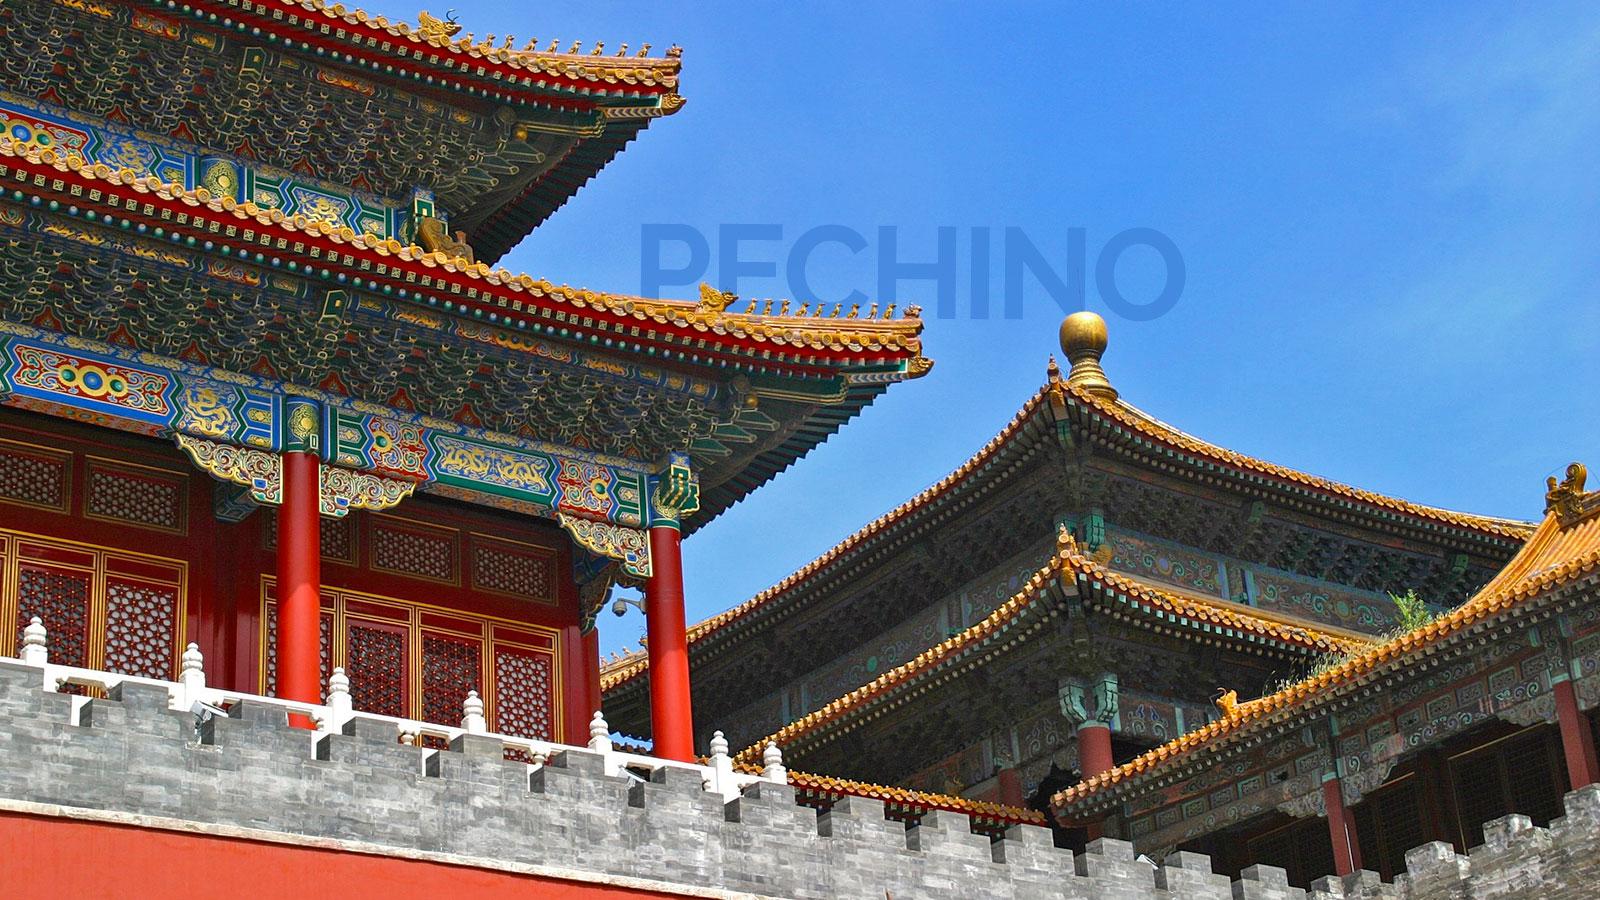 Estate INPSieme vacanza studio a Pechino